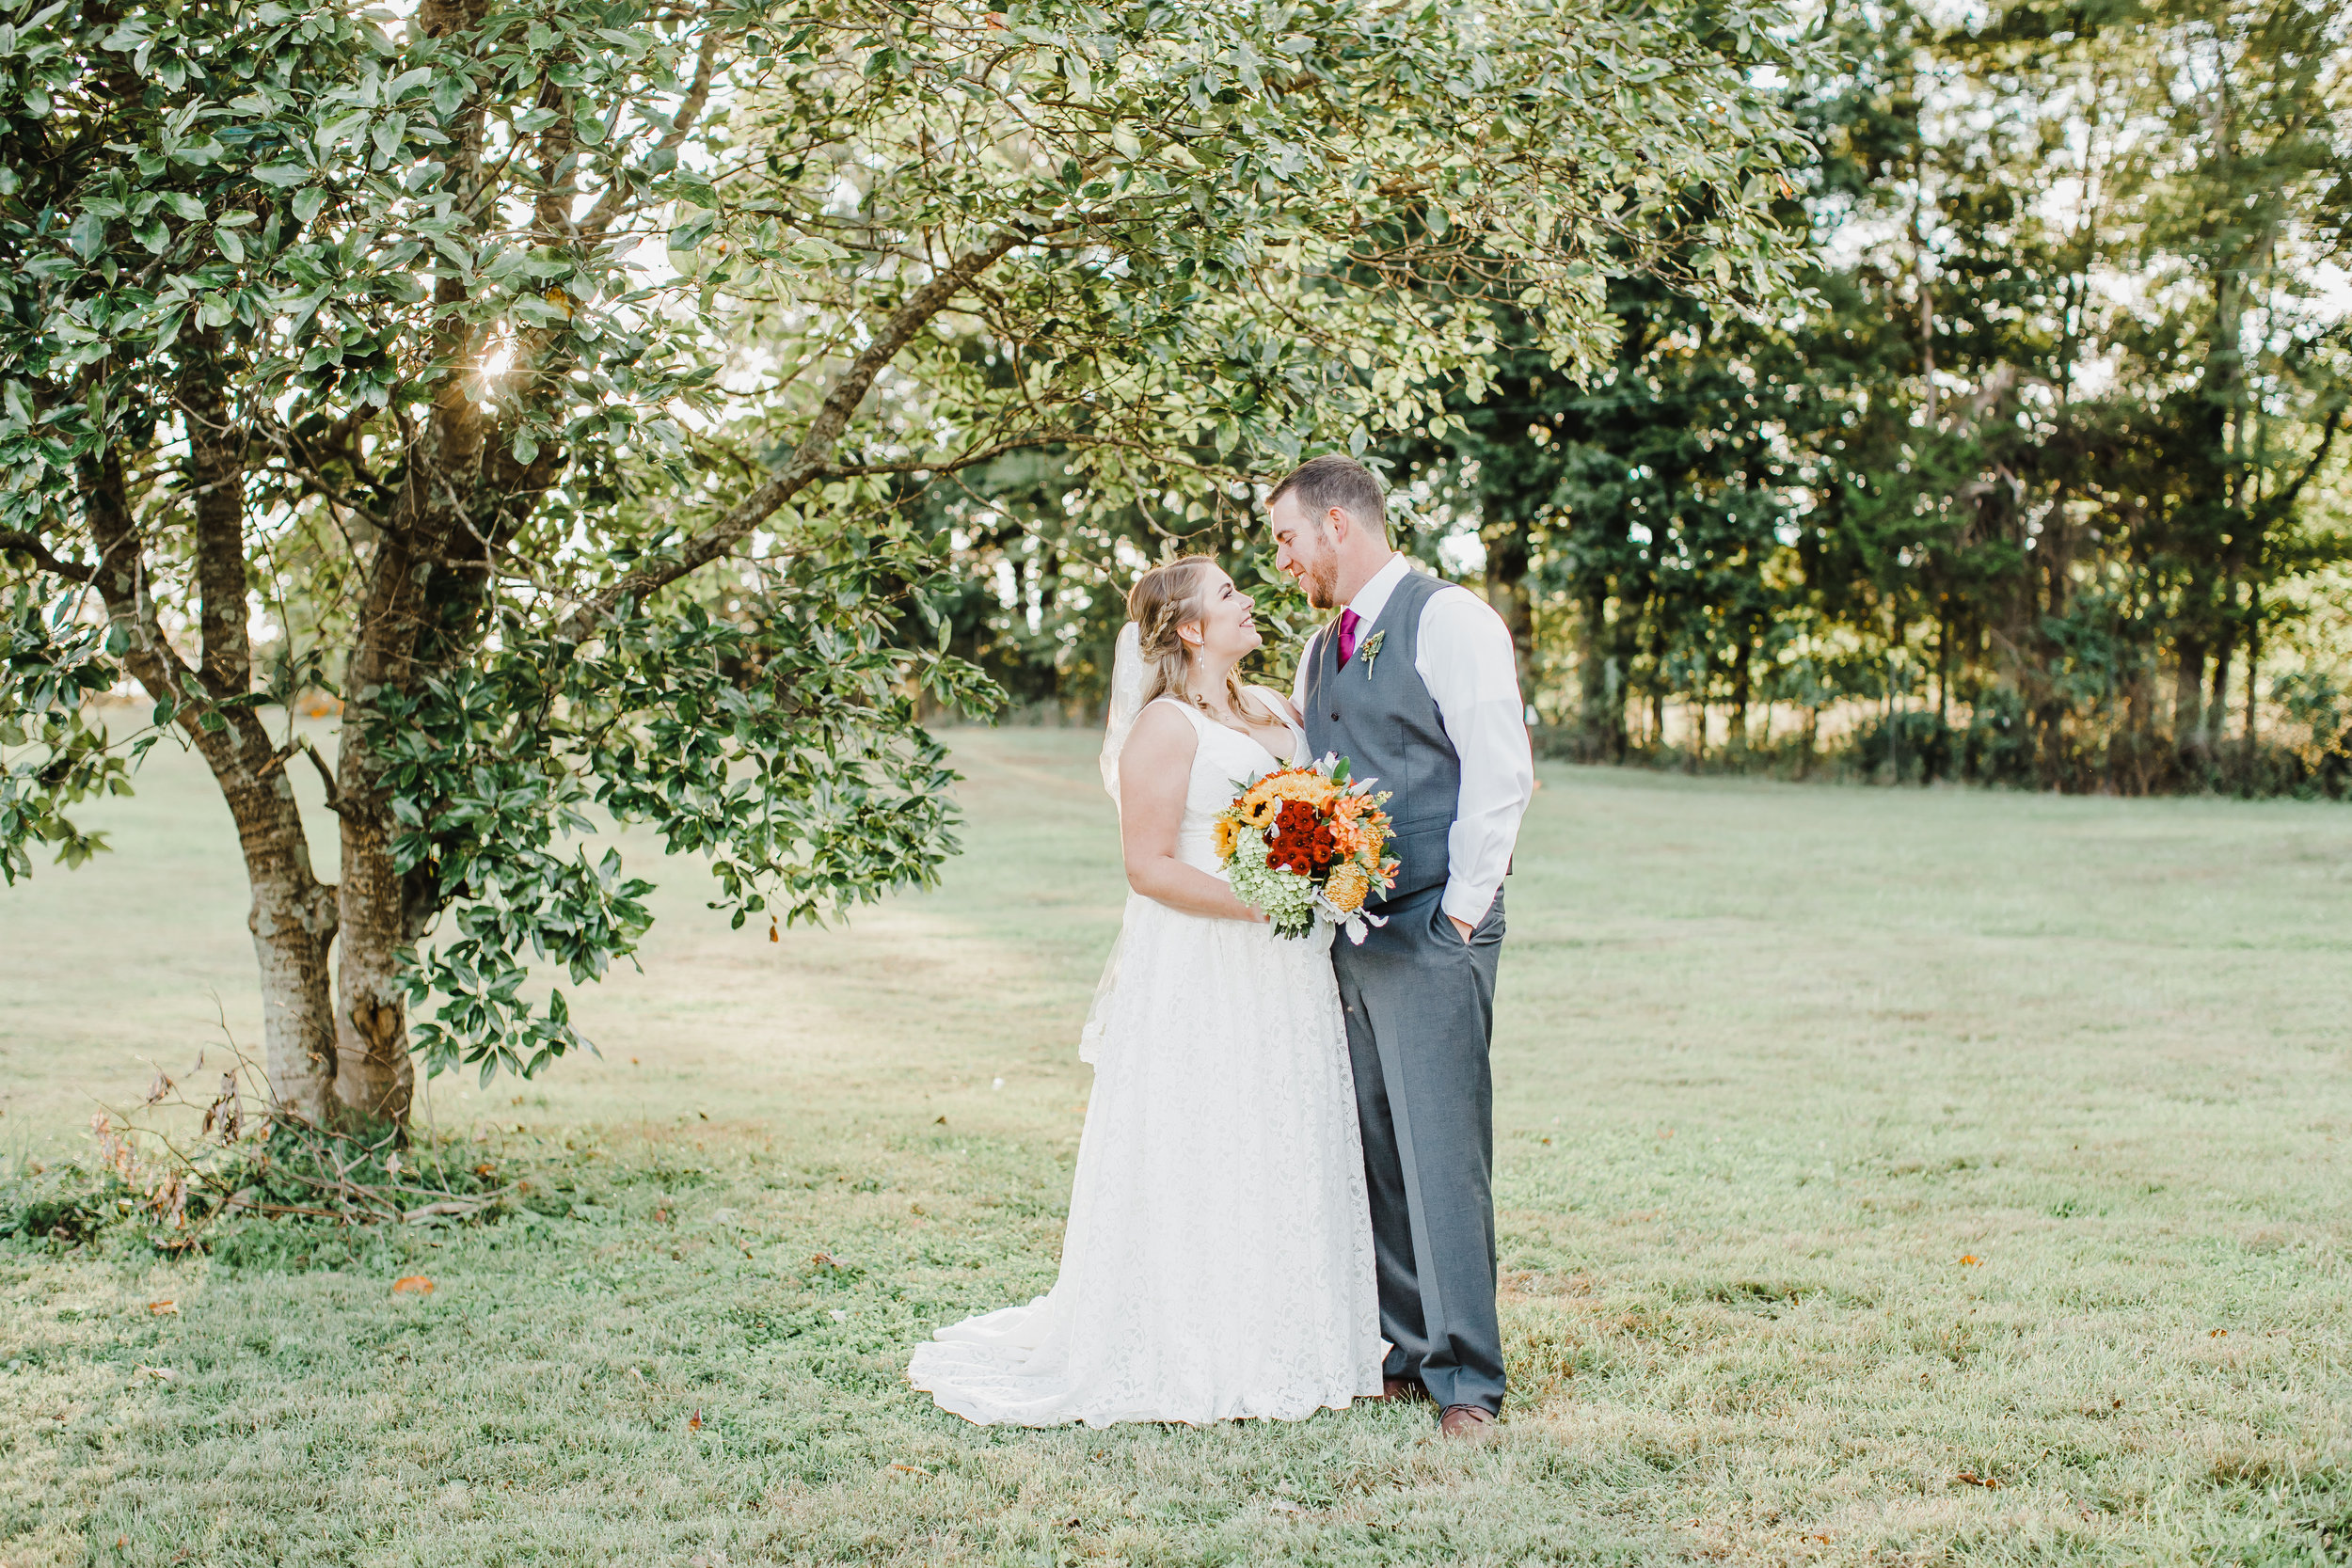 Fling - Virginia Wedding Photographer - Photography by Amy Nicole-1020-24.jpg